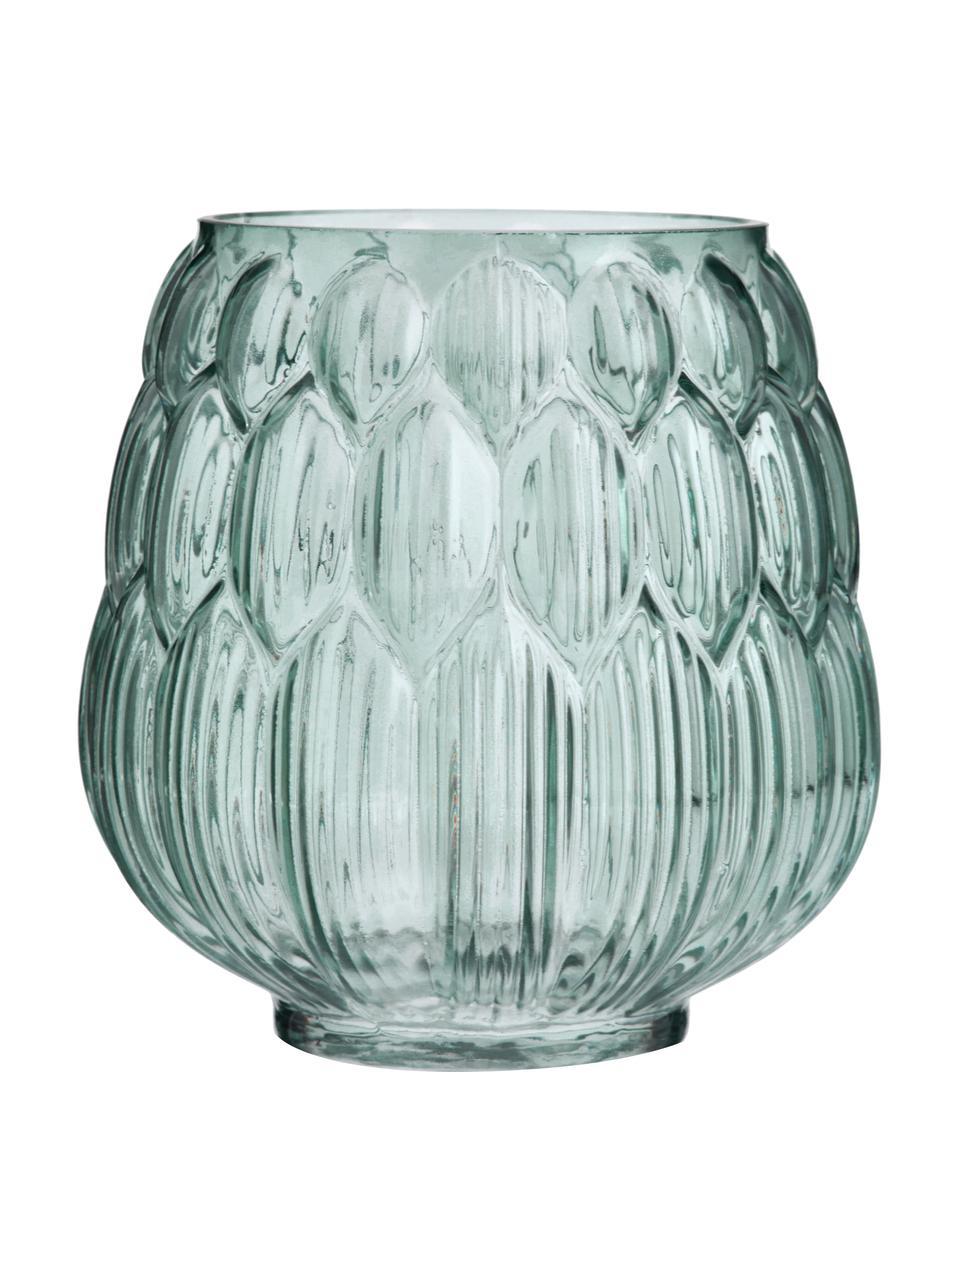 Kleine Glas Vase Berry in Petrol, Glas, Petrol, Ø 14 x H 15 cm